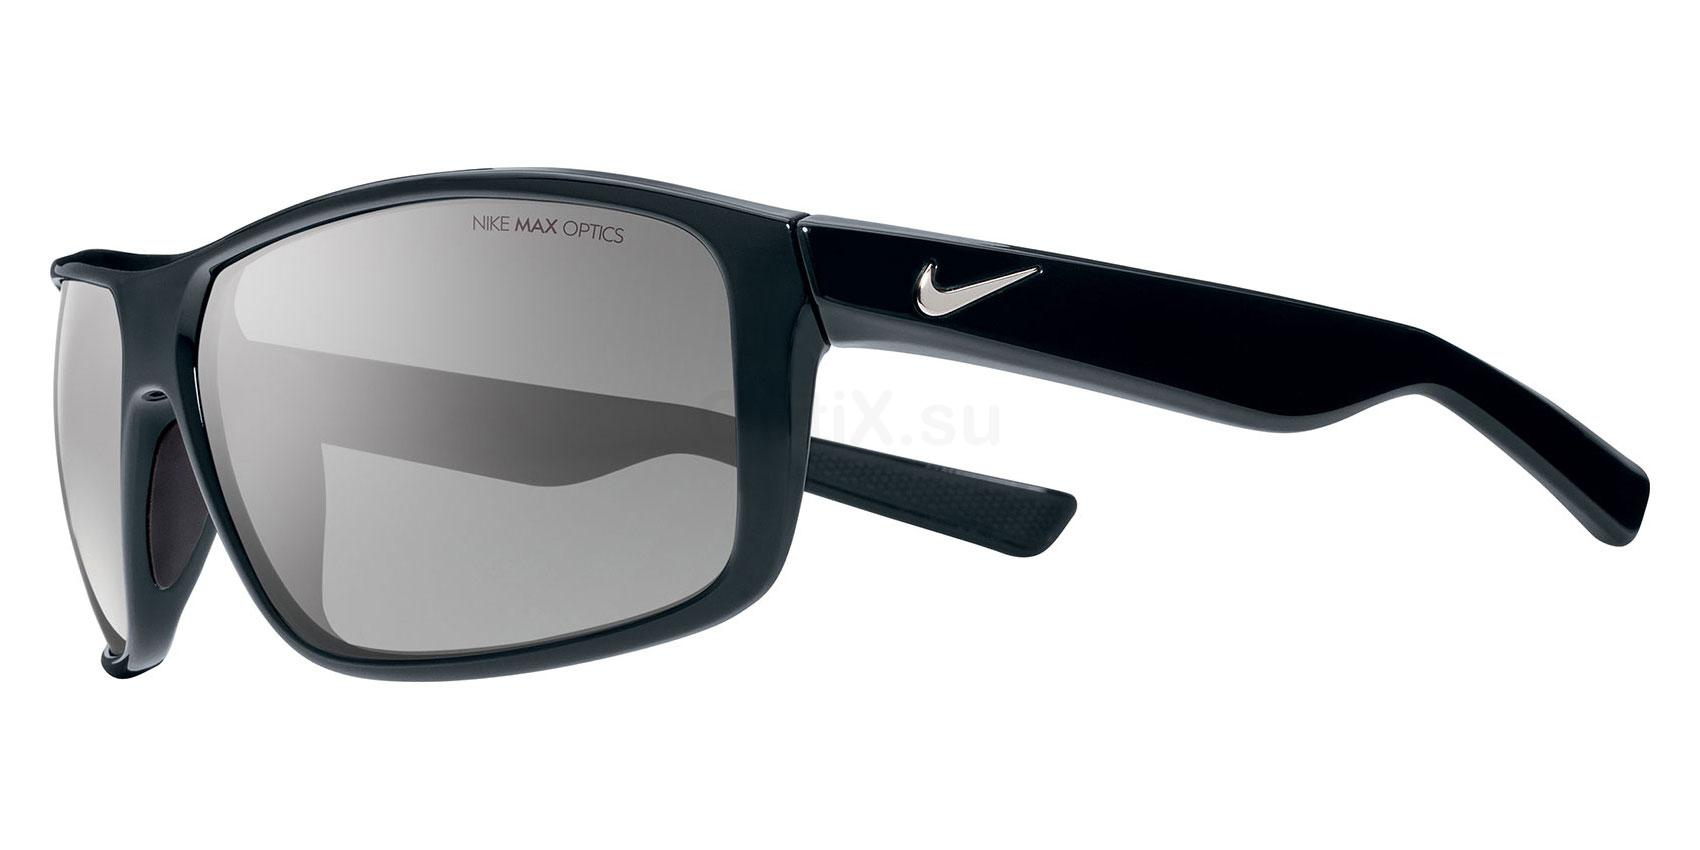 009 NIKE PREMIER 8.0 EV0792 , Nike